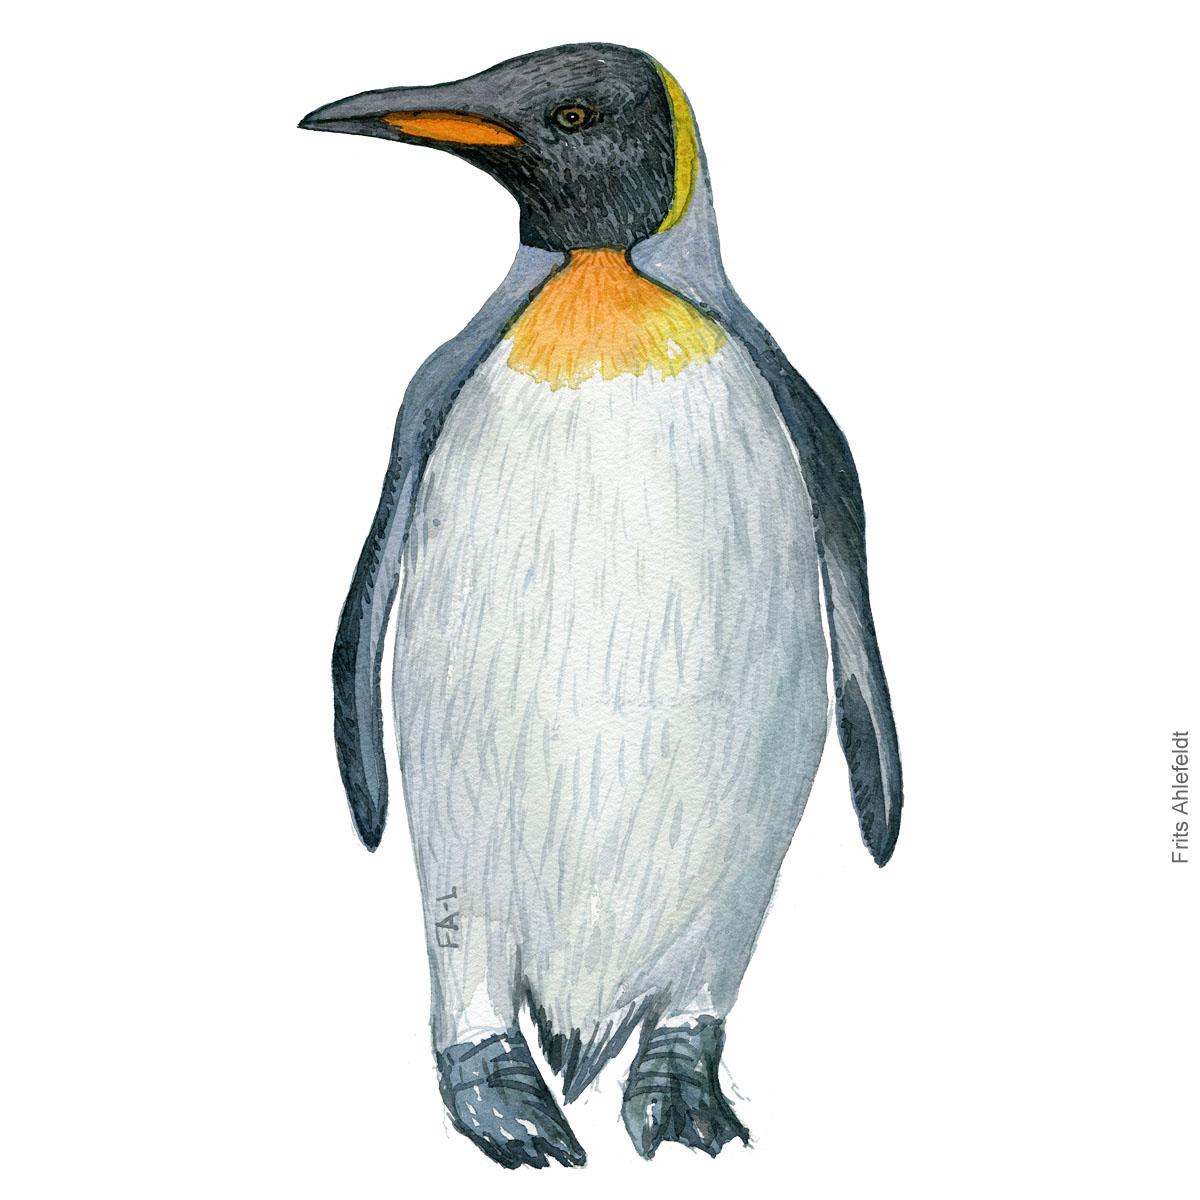 Kongepingvin - King penguin watercolor illustration. Painting by Frits Ahlefeldt - Fugle akvarel tegning